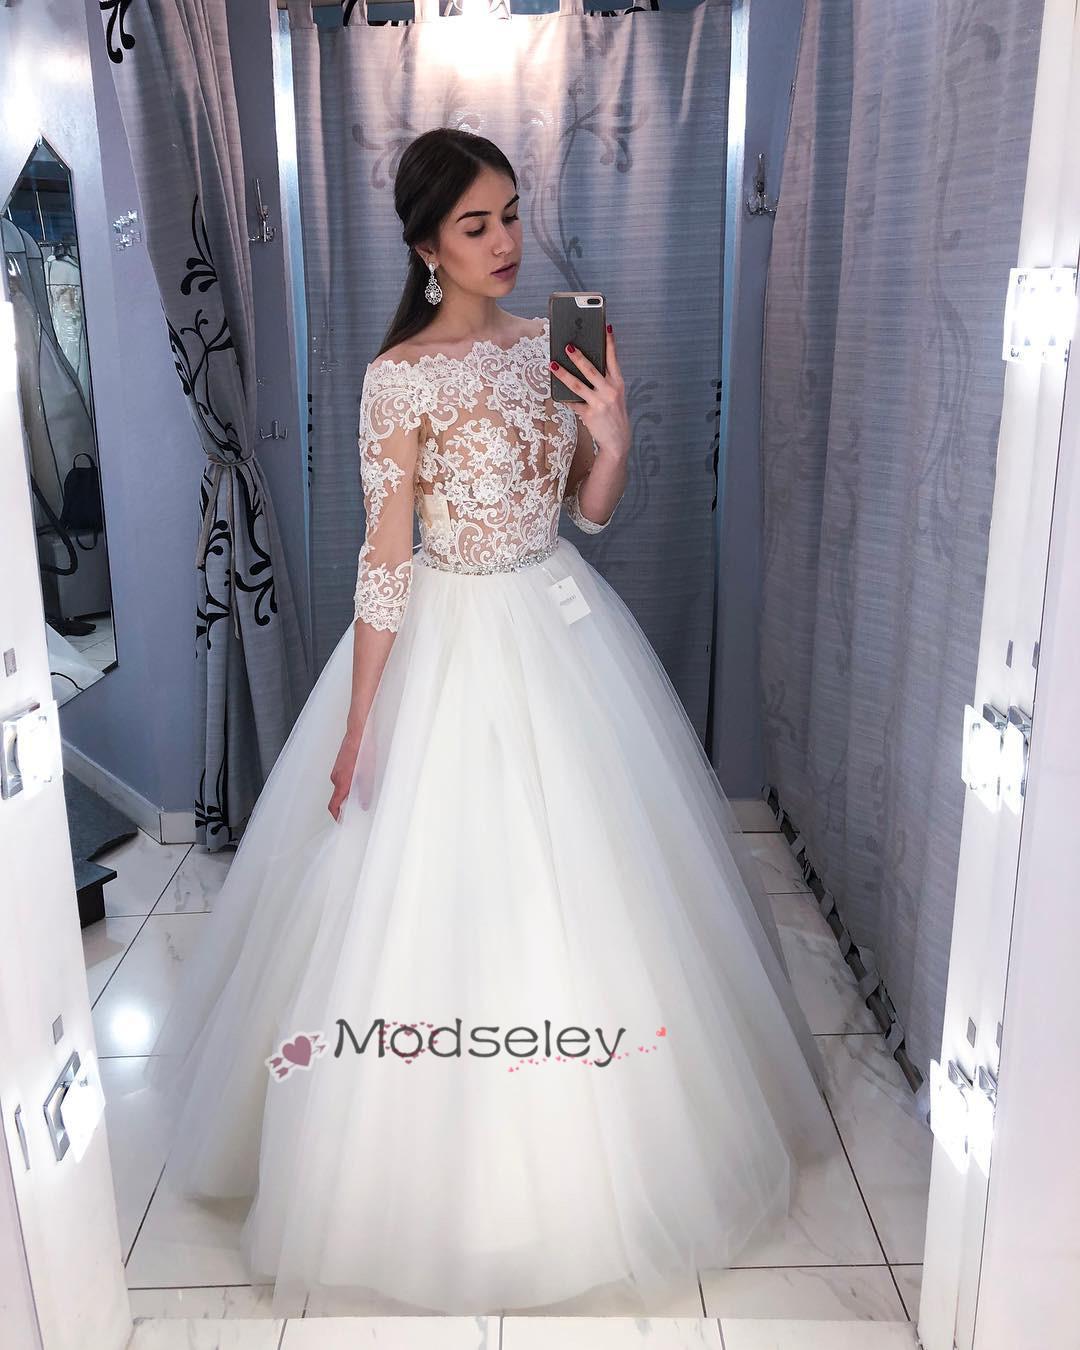 3b29c13bc188 Gorgeous Half Sleeves White Long Wedding Dress · modseleystore ...